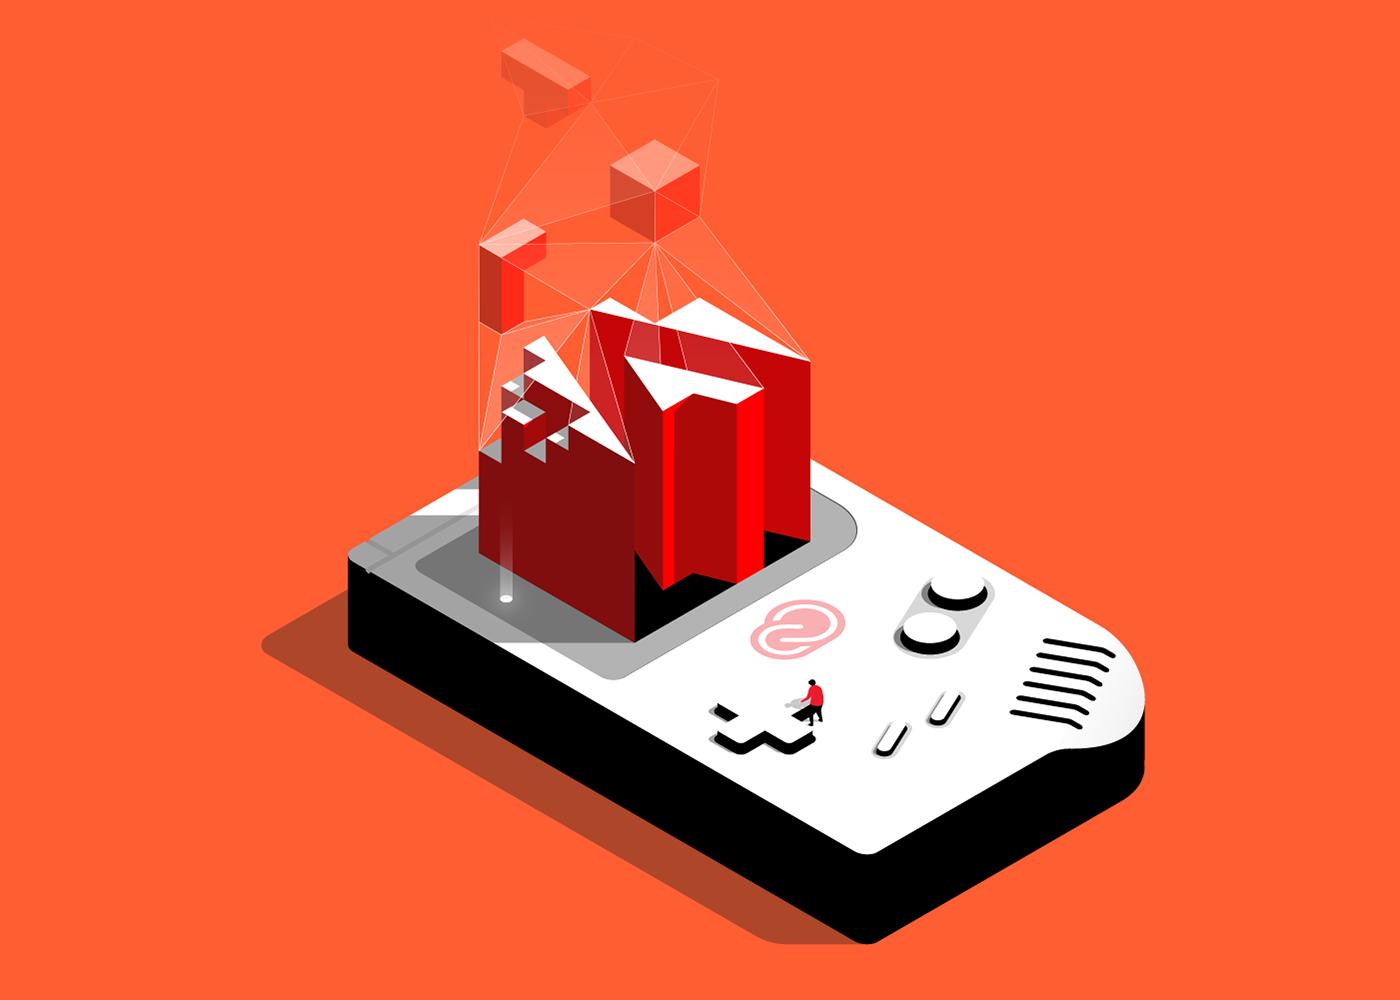 Game Boy vector isometric illustration